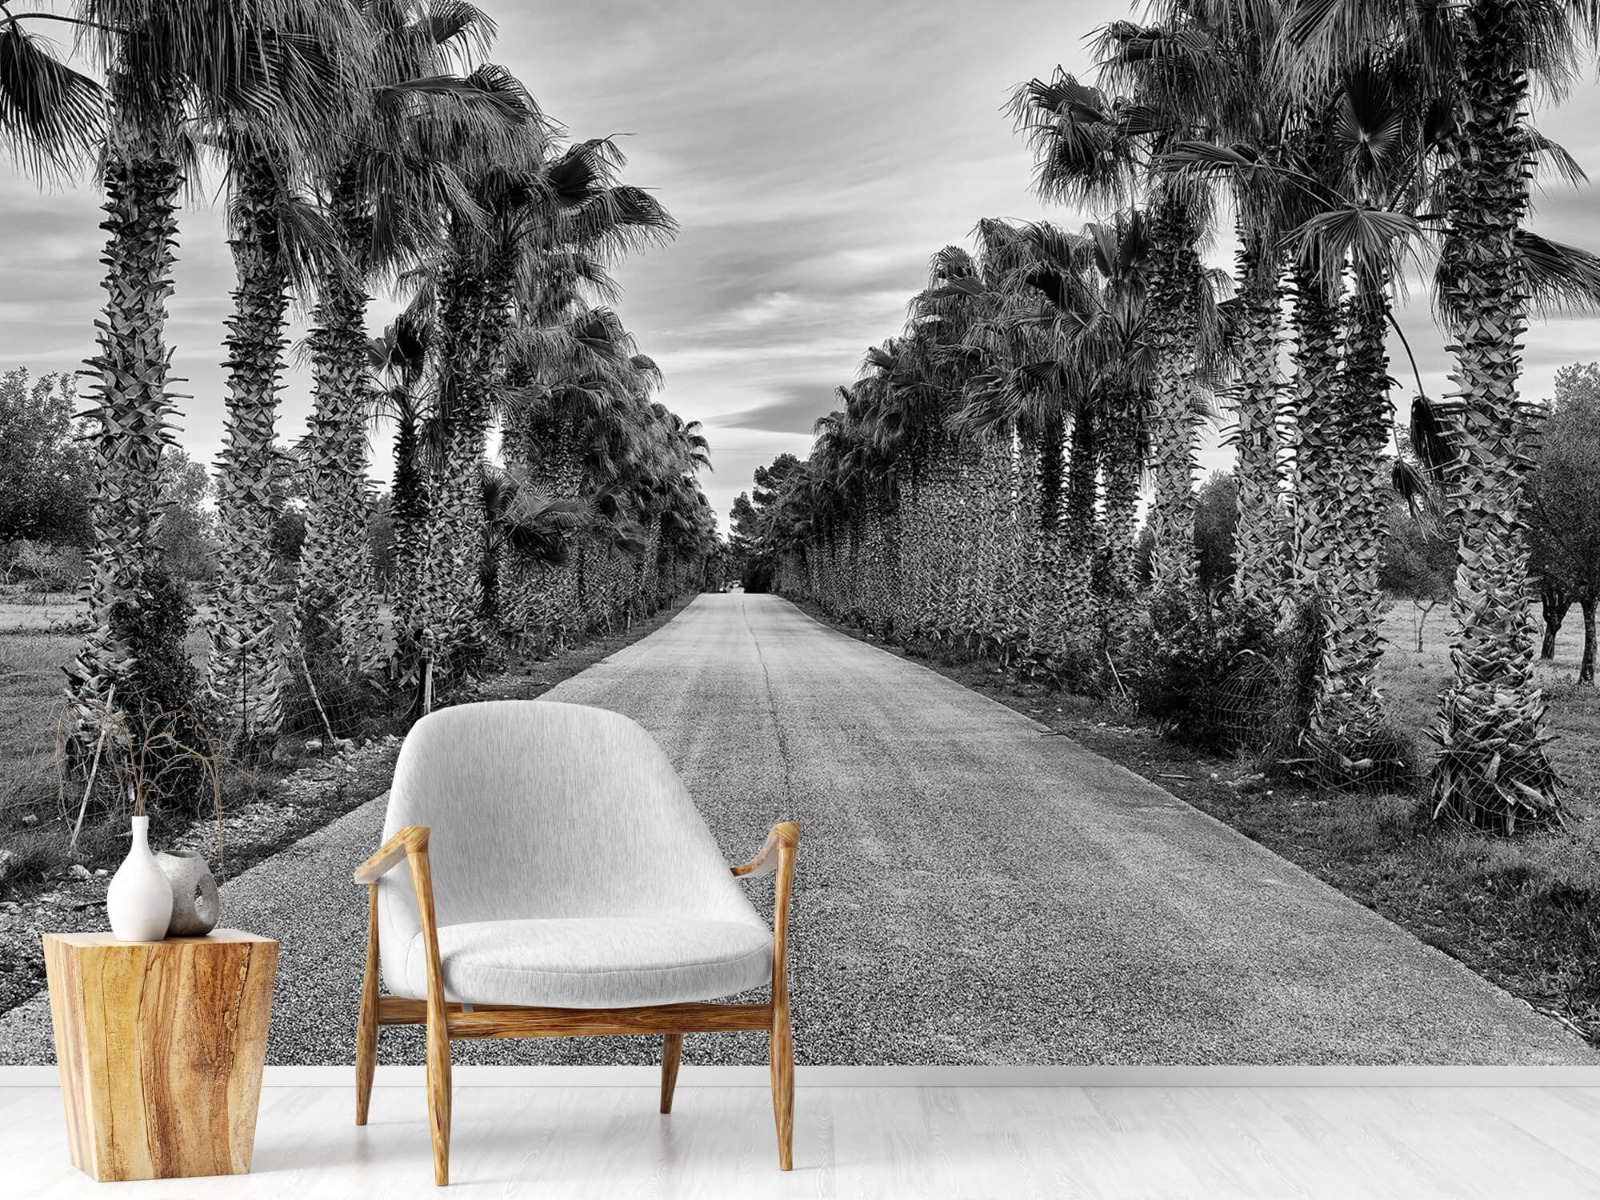 Palmbomen - Straat met palmbomen - Woonkamer 18